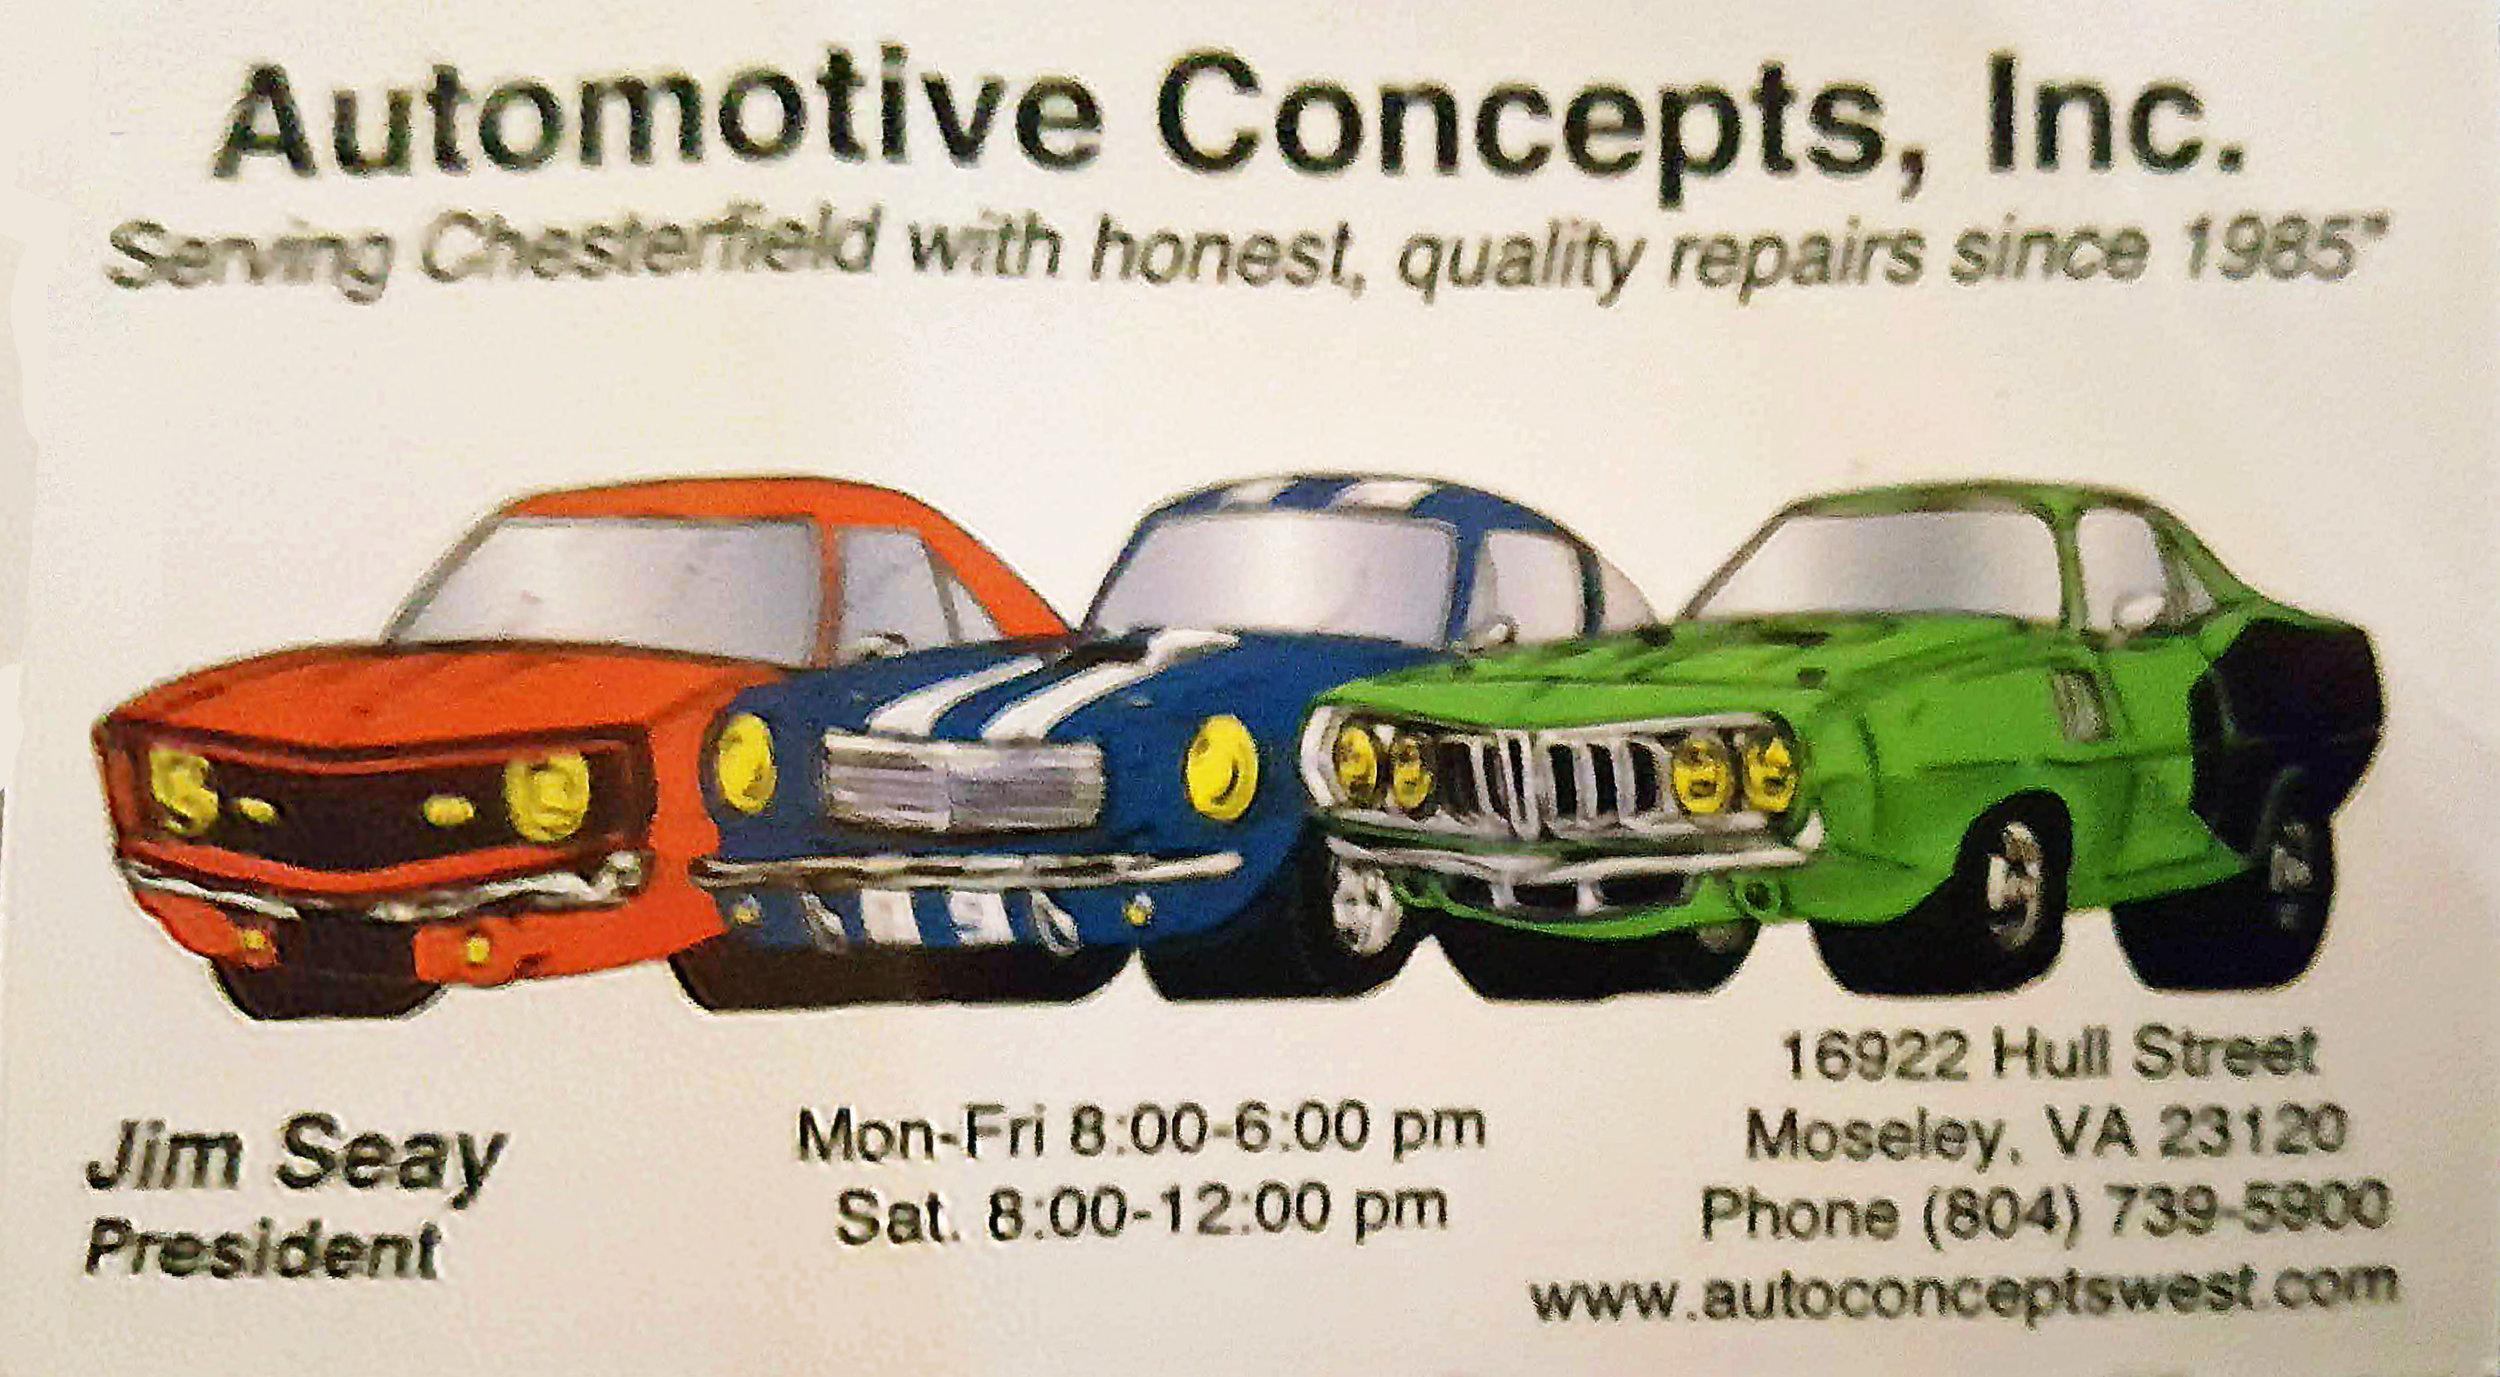 Automotive Concepts     Jim Seay  16922 Hull Street Moseley, VA 23120 804-739-5900